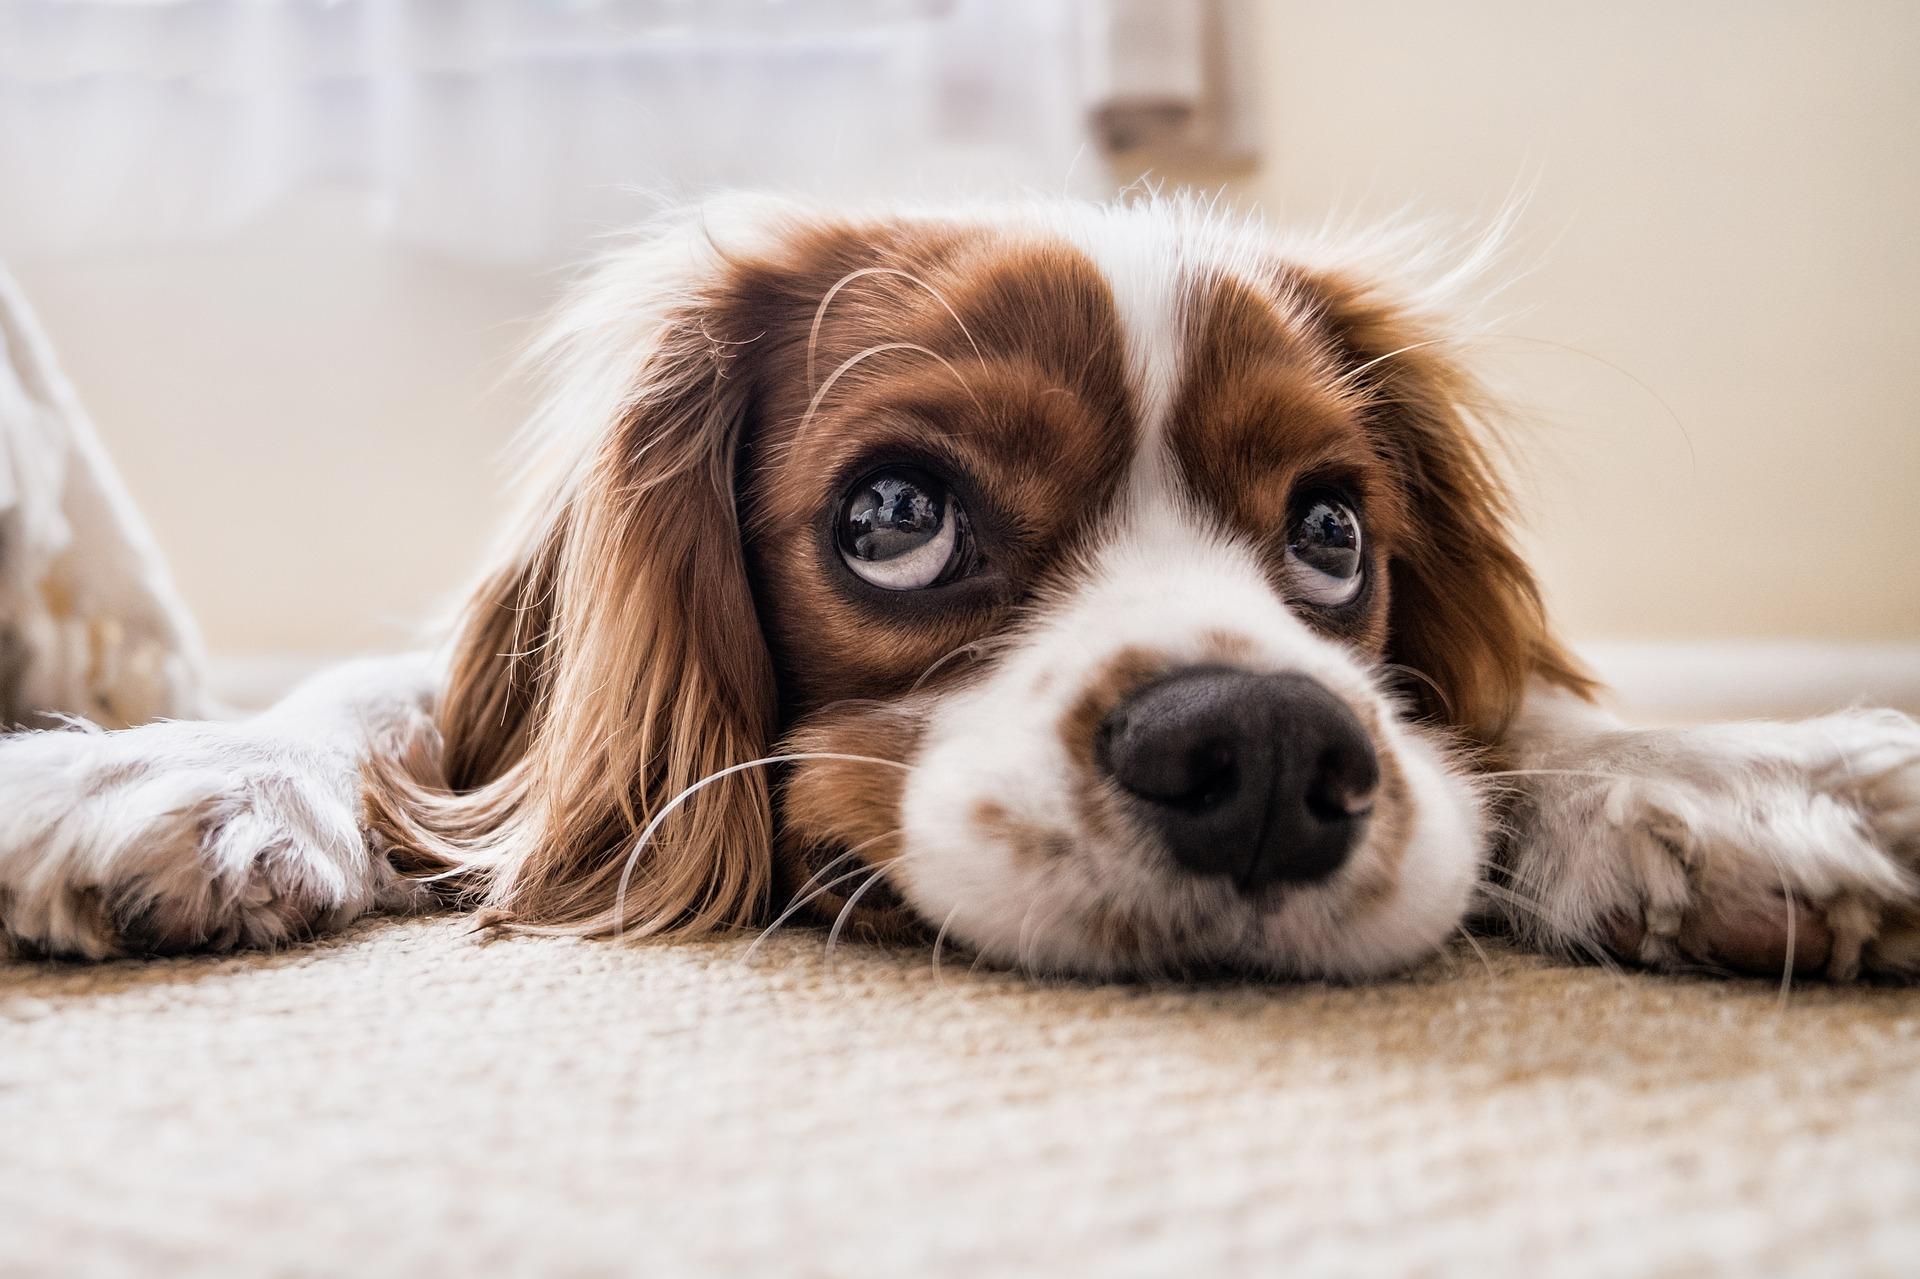 dog-napping-digital-detox